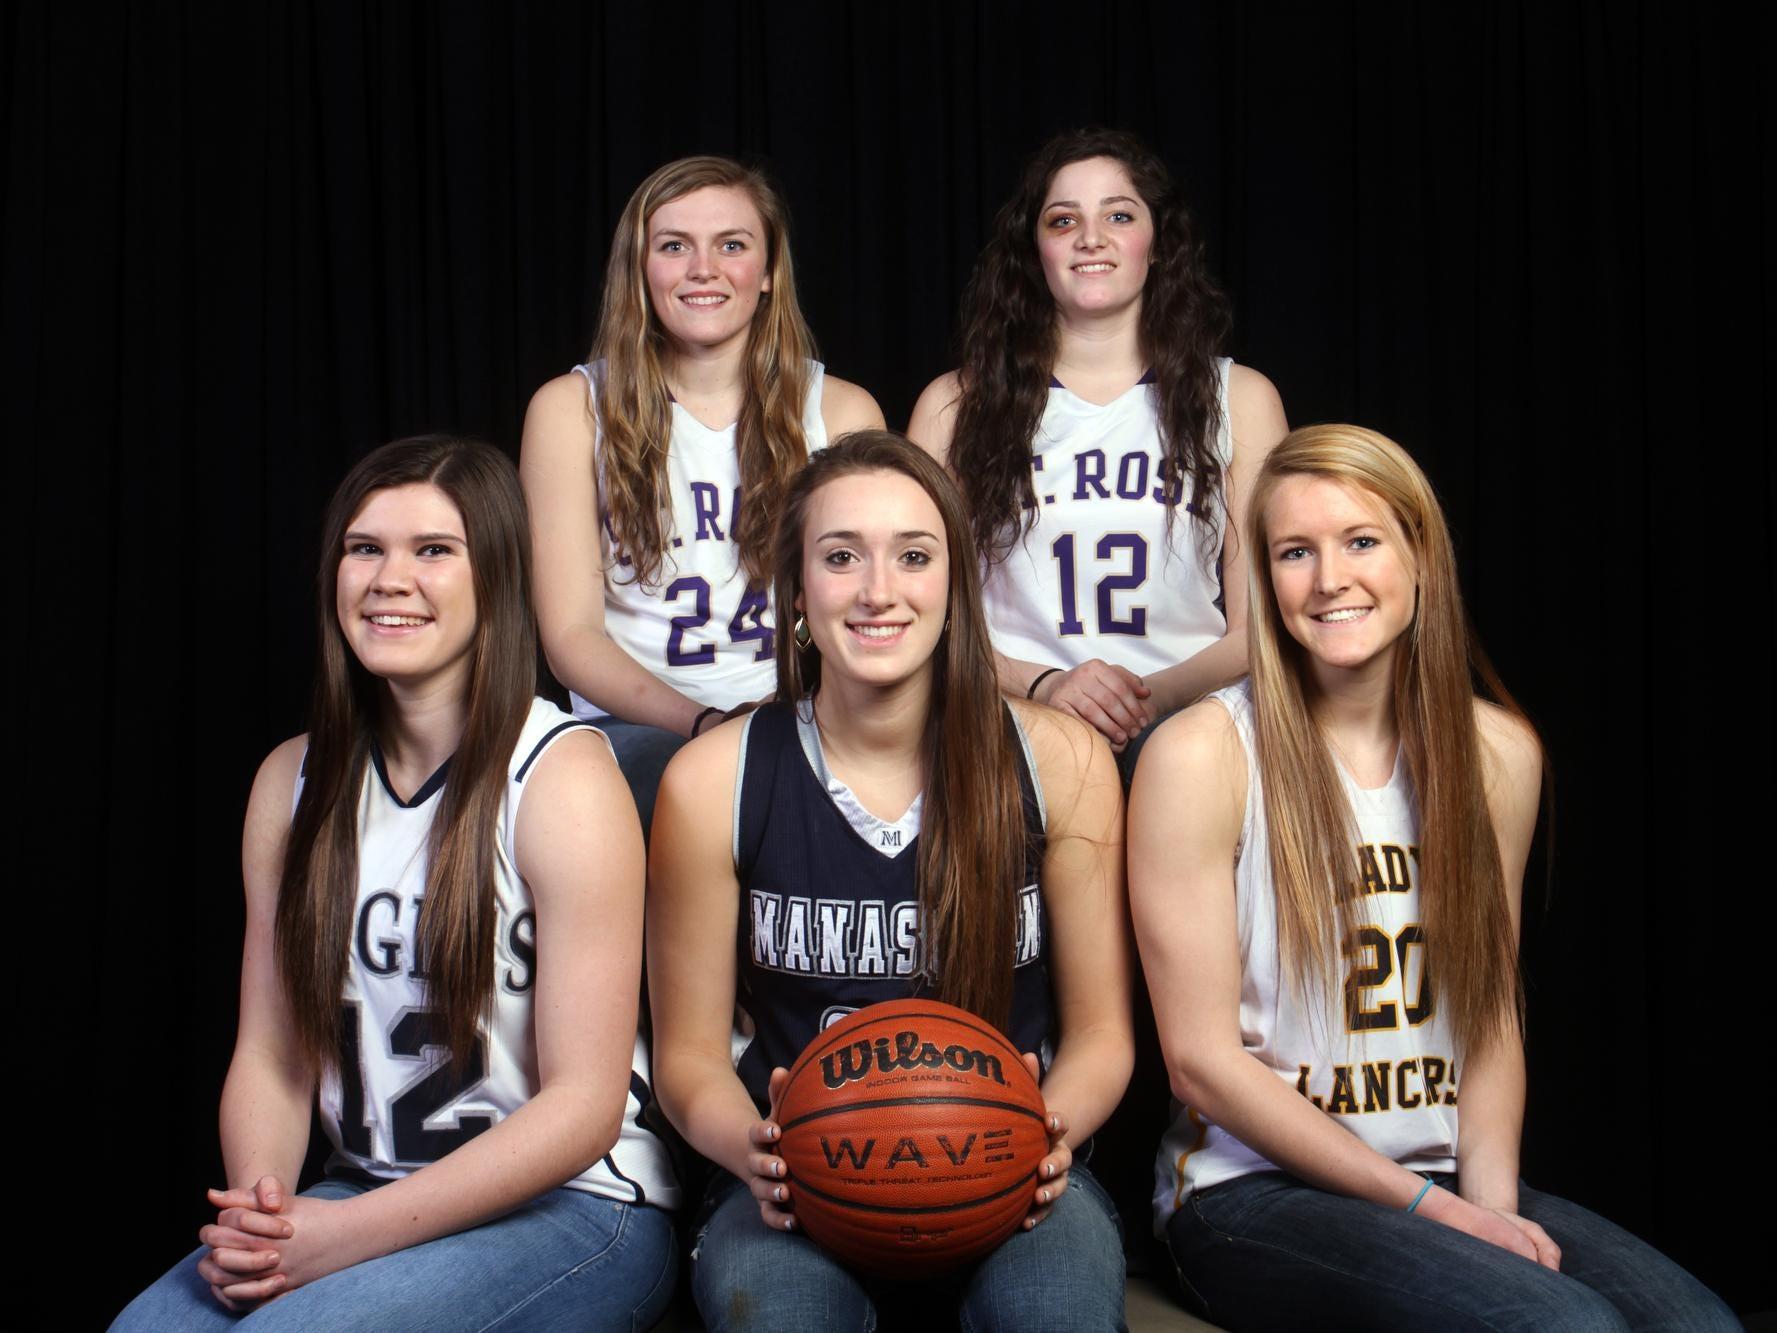 The 2014-15 Asbury Park Press All-Shore Girls Basketball Team.